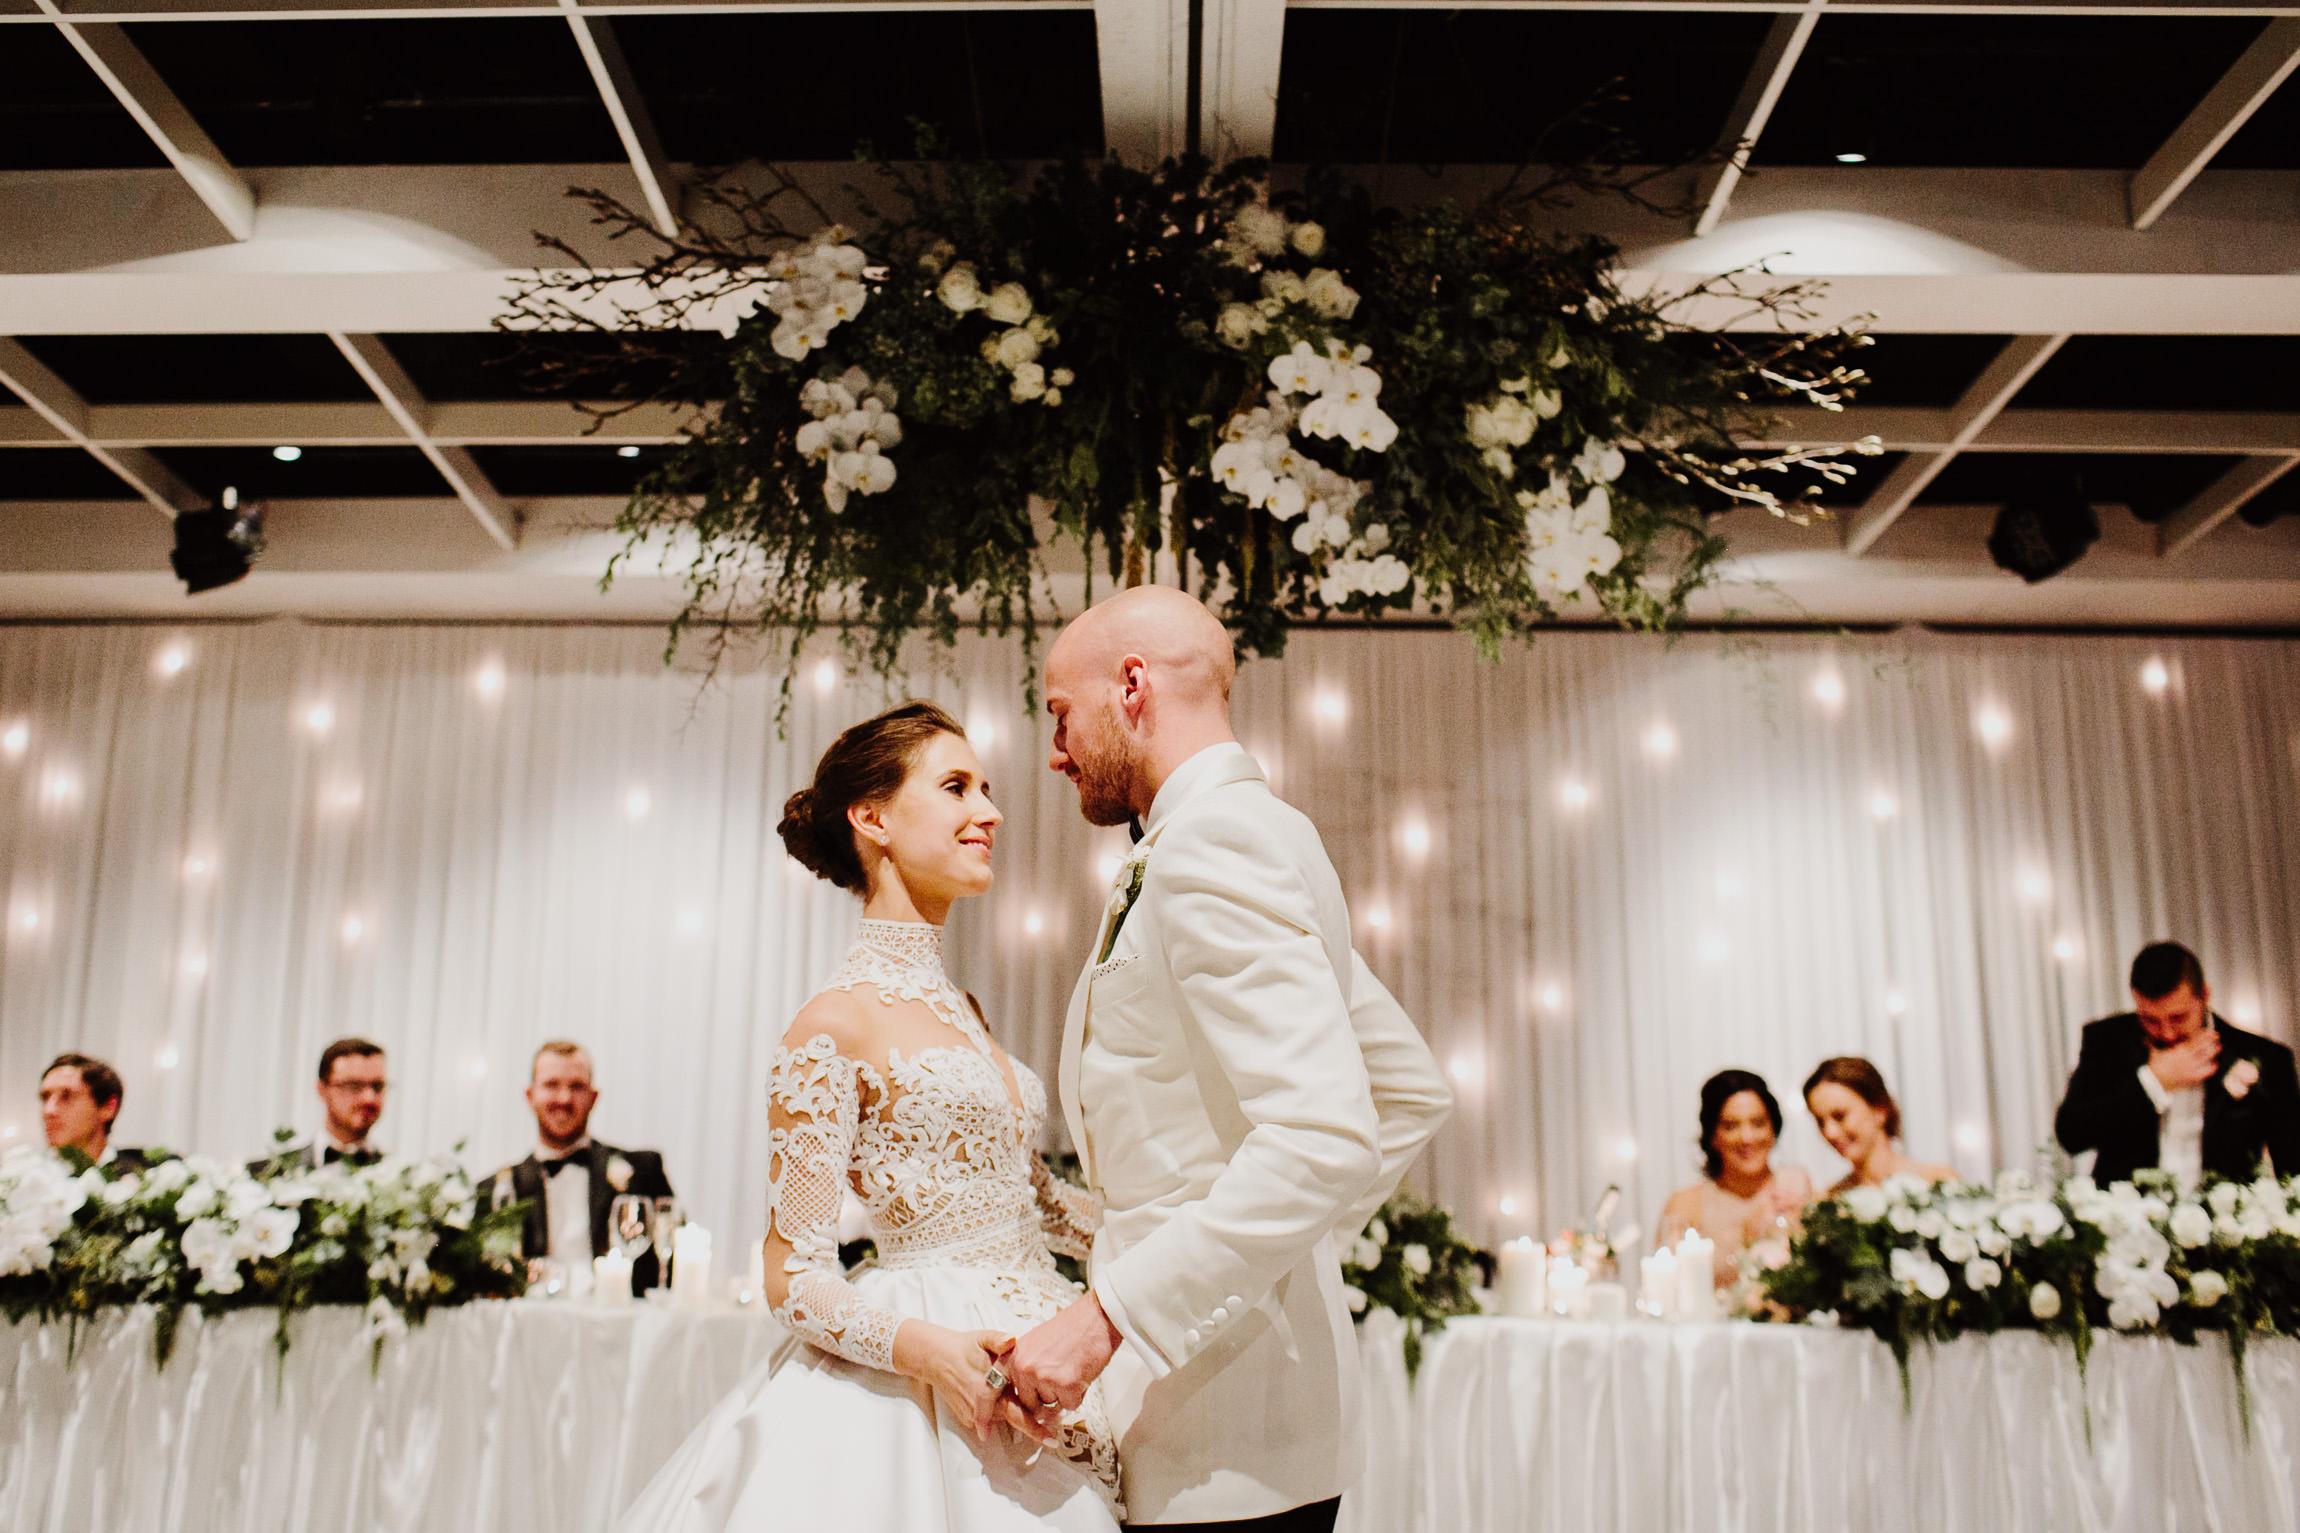 150623_justinaaron_wedding_bianca_ruben_pr-162.jpg